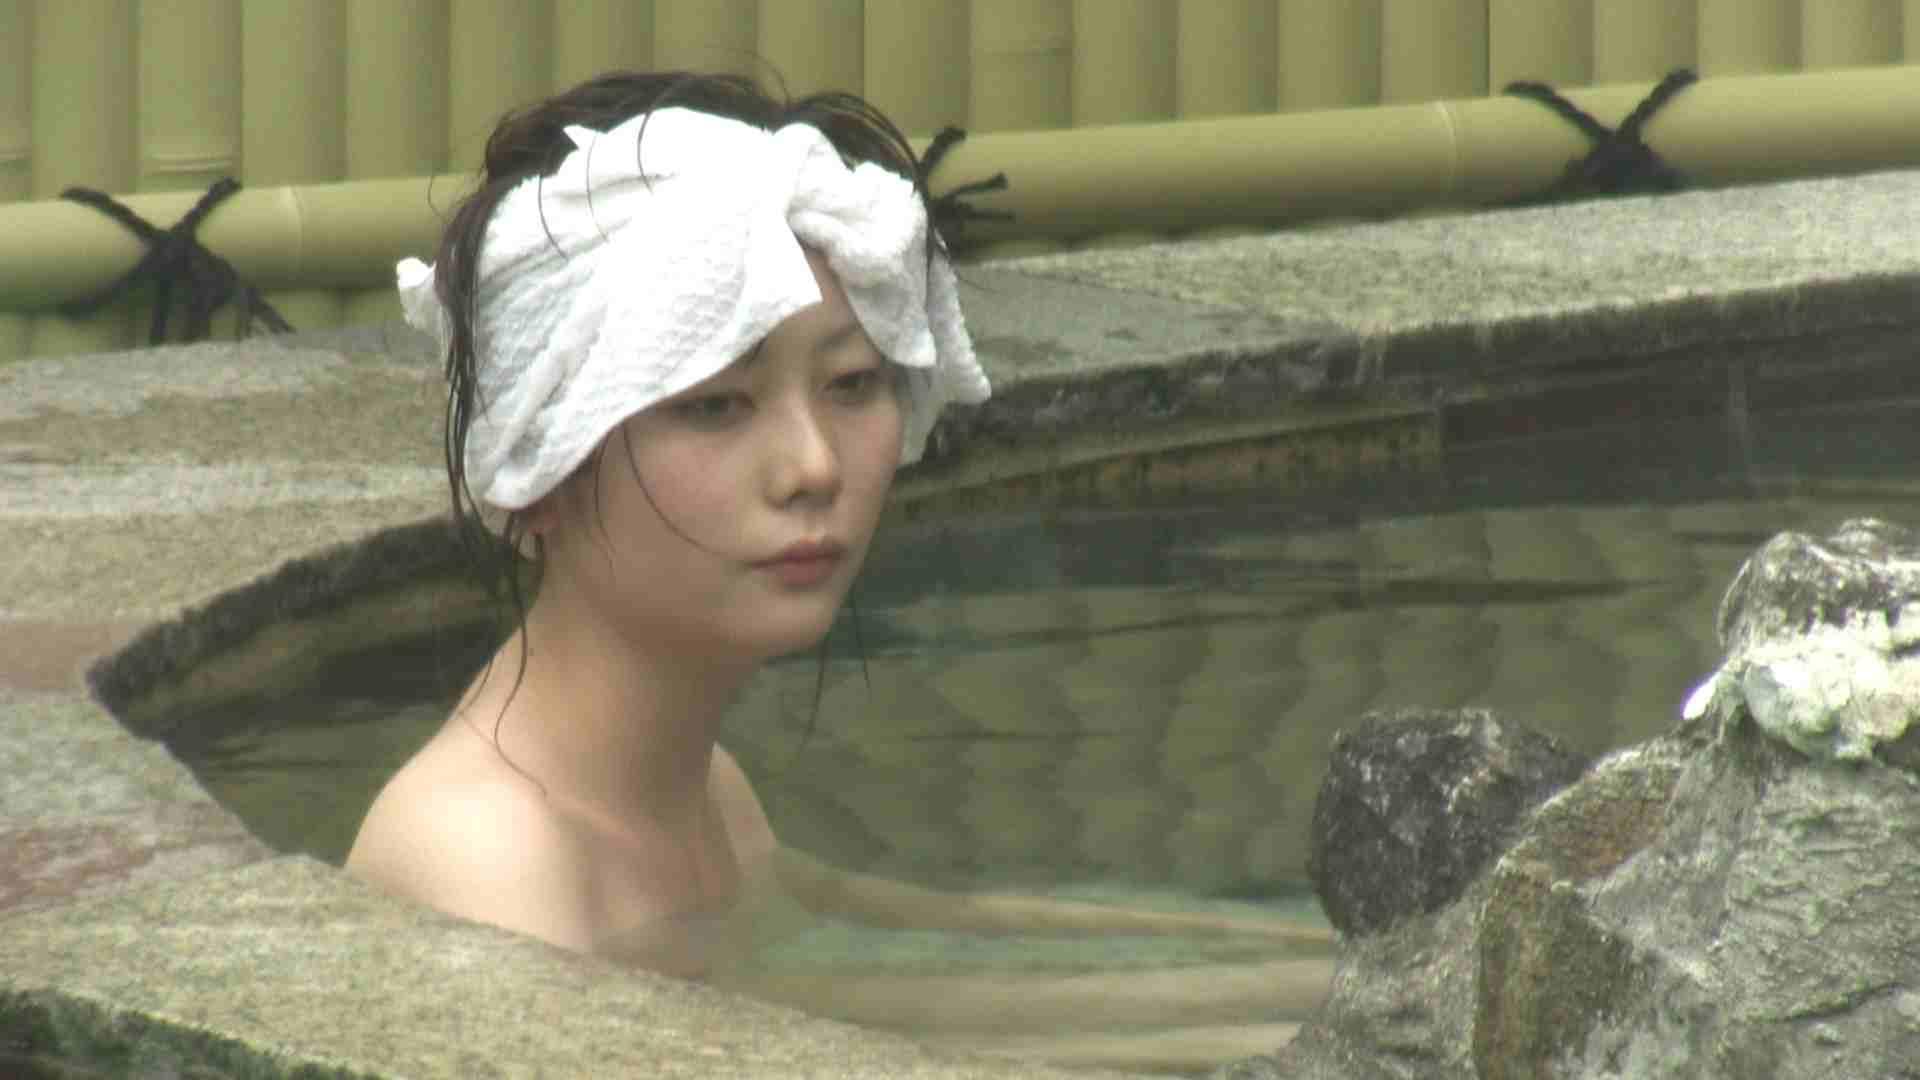 Aquaな露天風呂Vol.147 綺麗なOLたち アダルト動画キャプチャ 102枚 56